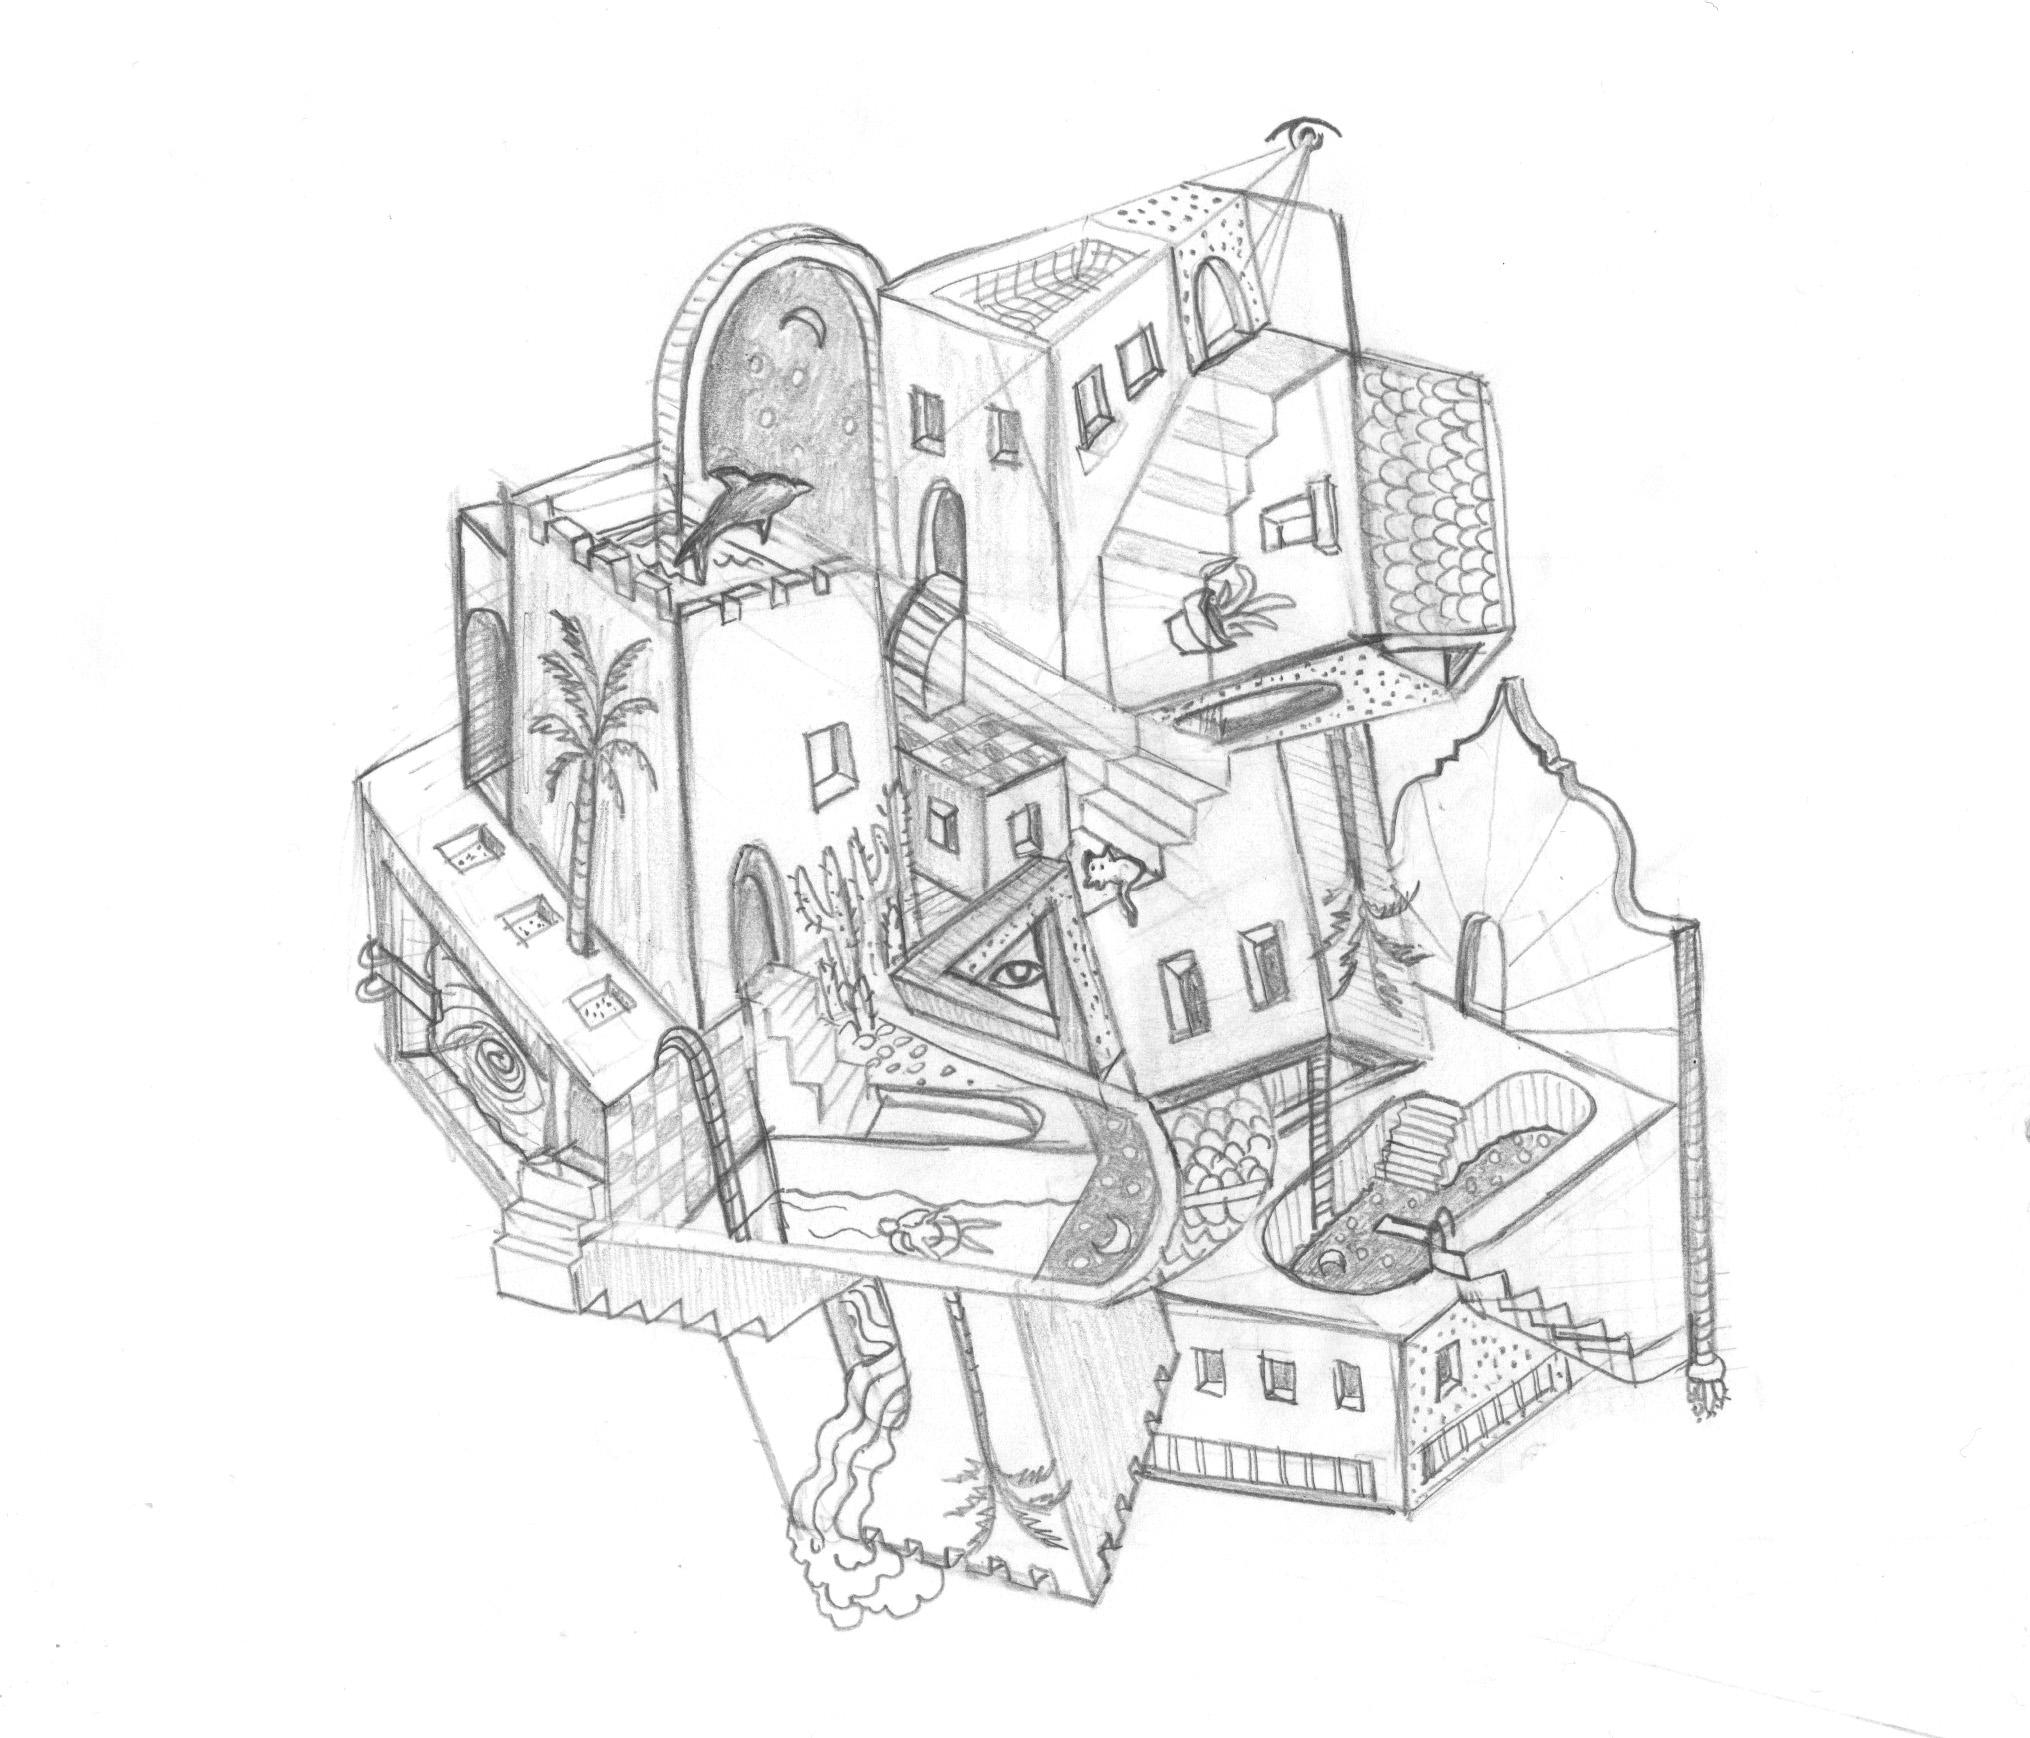 Clare Duffy Morocco multi perspective sketch.jpg